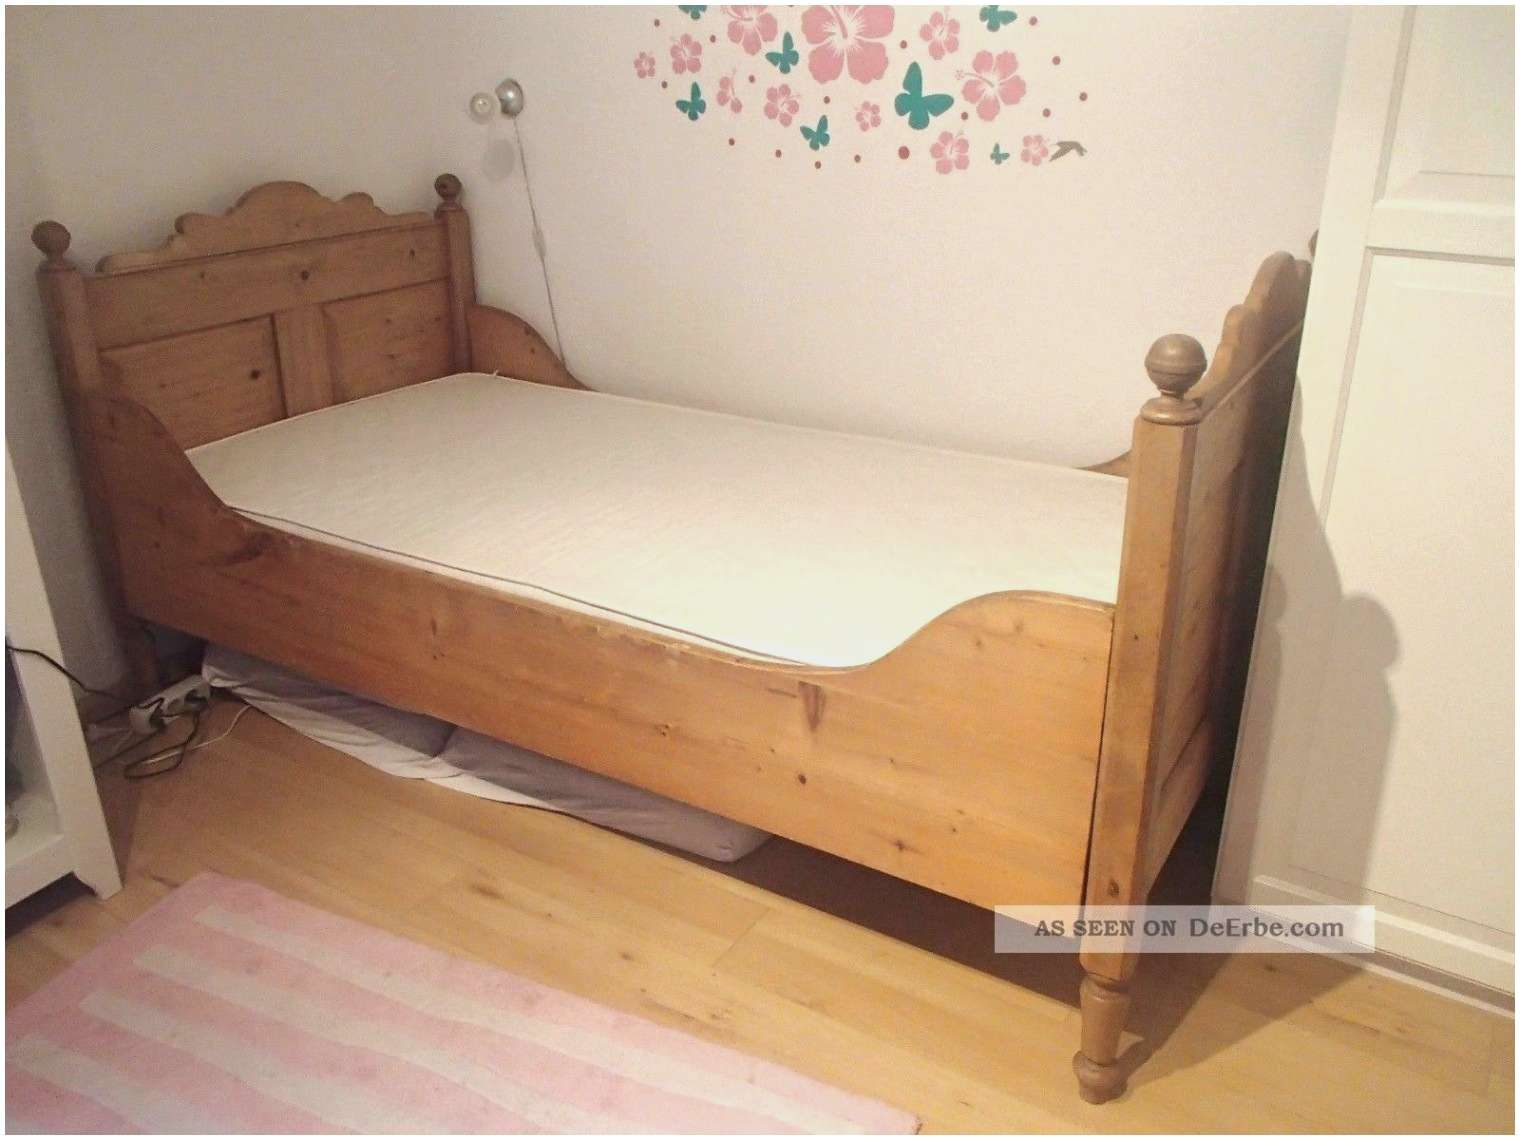 Lit Coffre 90×190 Ikea Meilleur De Beau sommier Ikea 90—190 Luxe Bett 90 X 190 Inspirierend Altes Bett